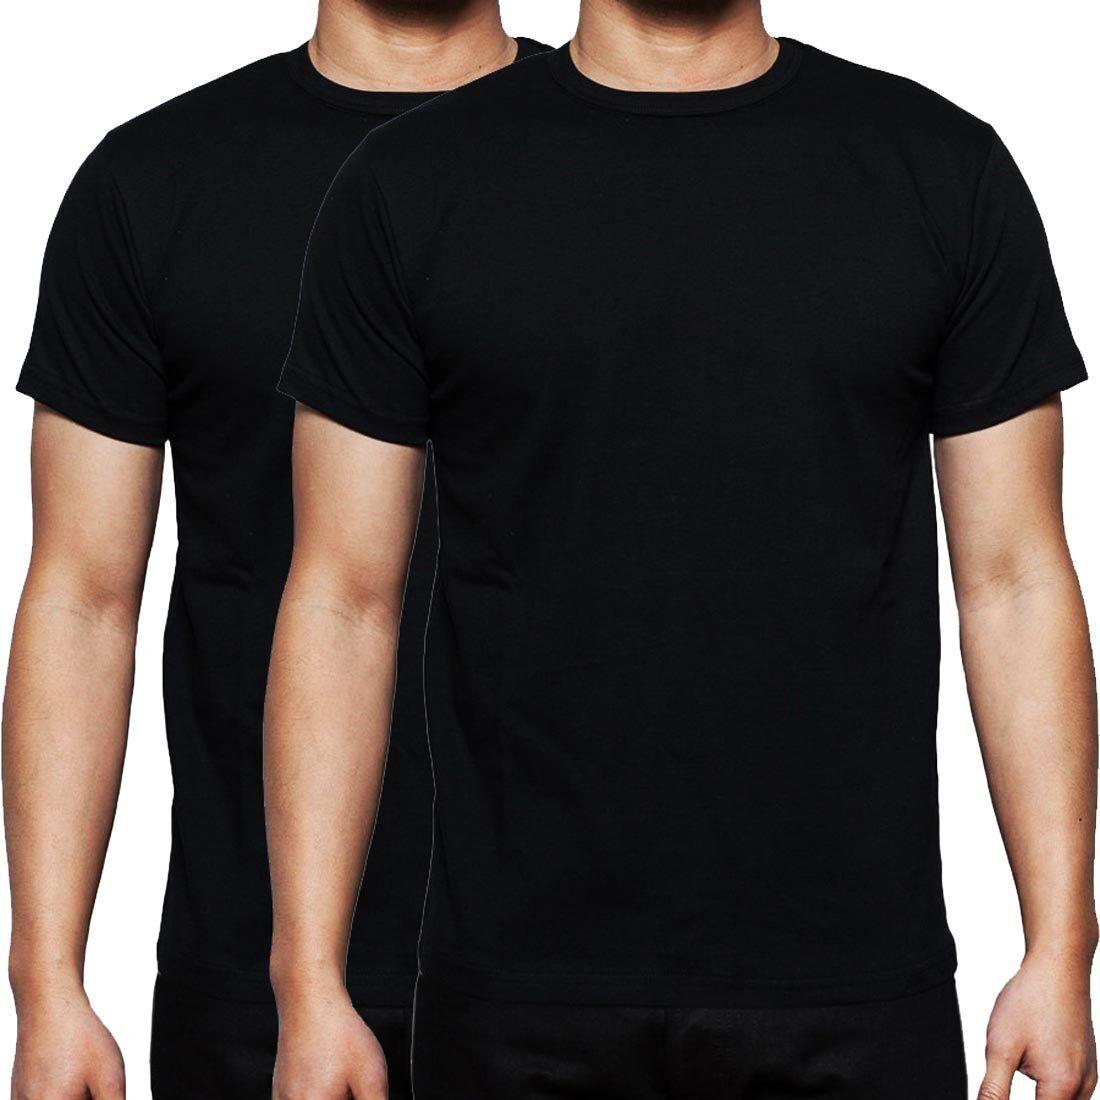 Gildan Mens 6 Pack Comfort Cotton Casual V-Neck T-Shirts Multipack Tee Lot S-2XL